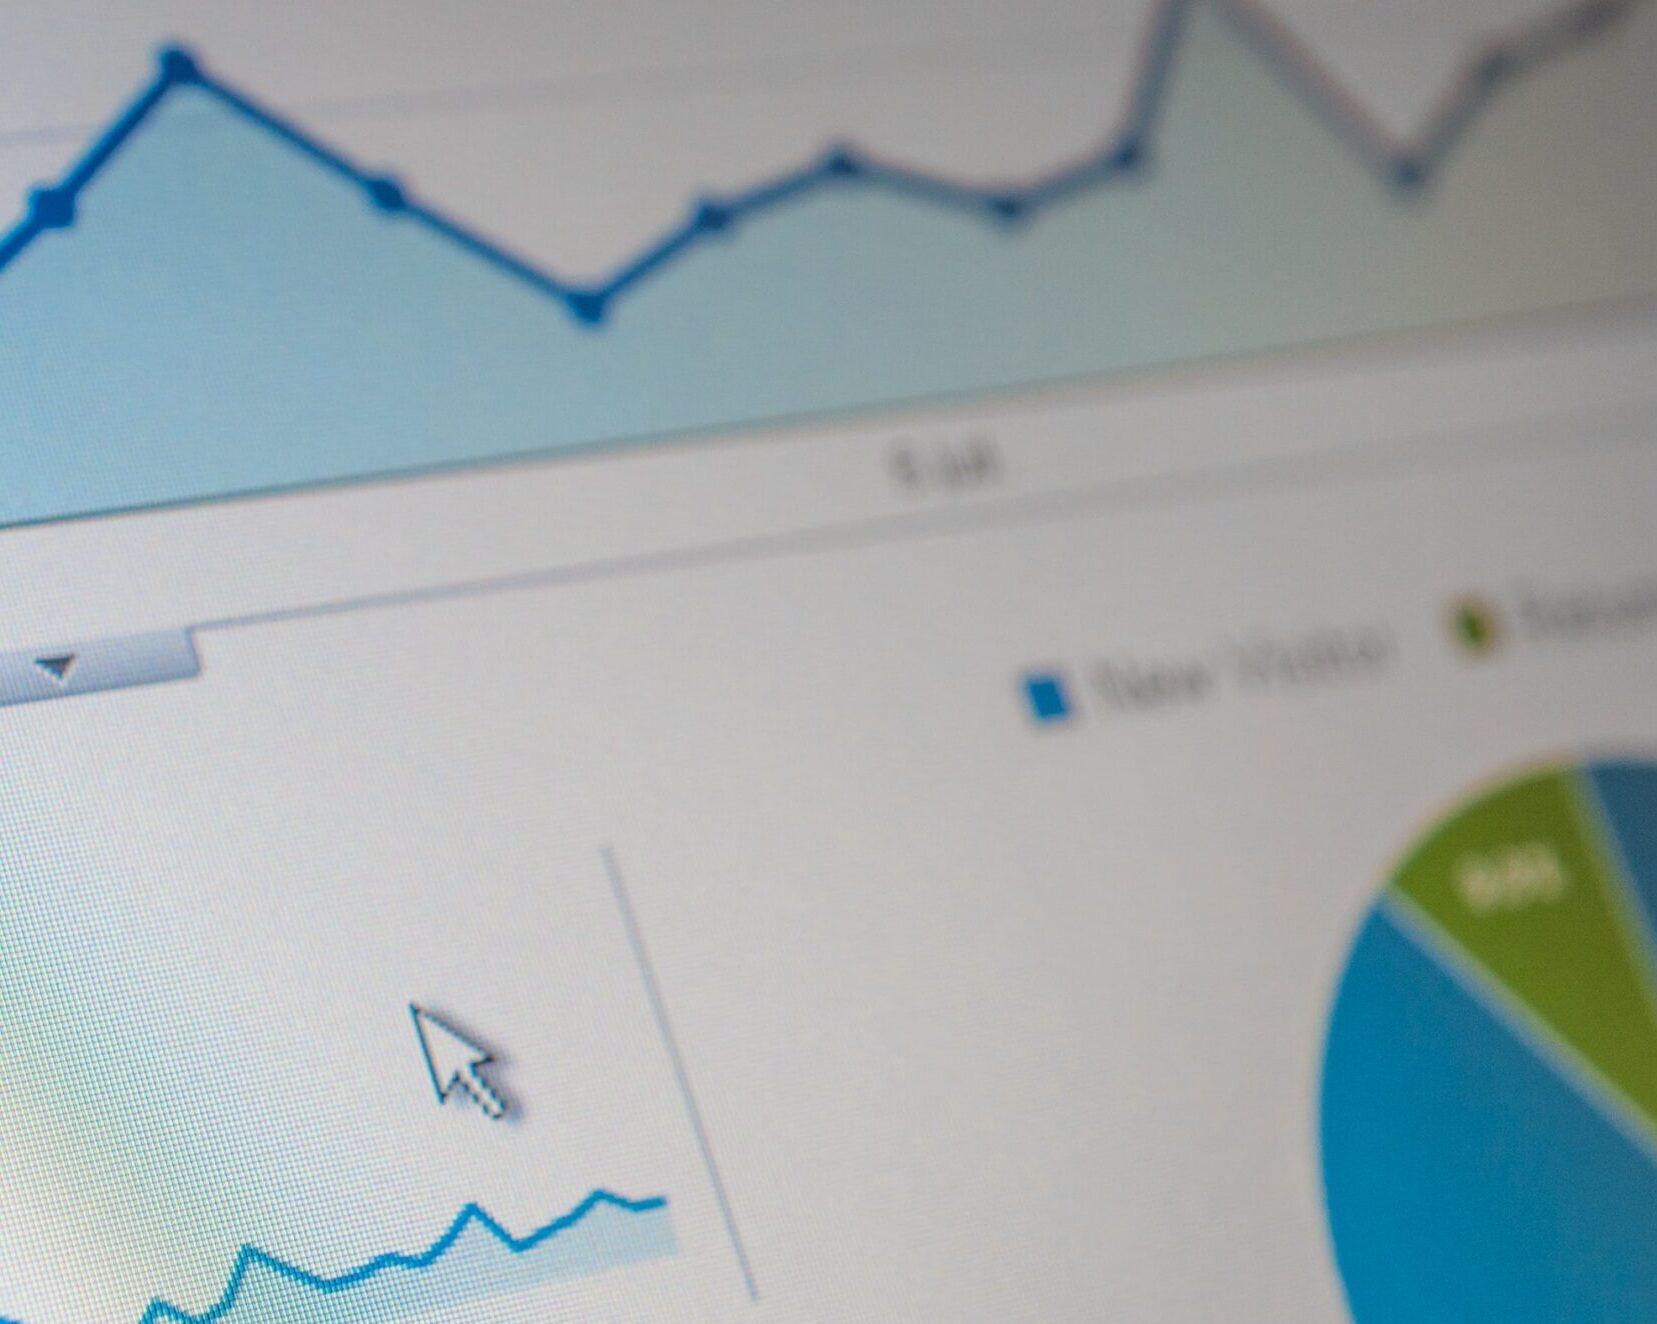 icarus data analytics